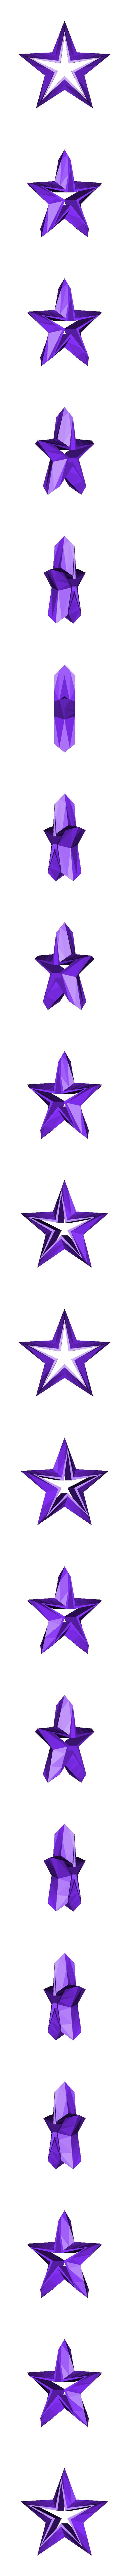 big star.stl Download STL file christmas pack • 3D printer model, sebastiandavidsalas